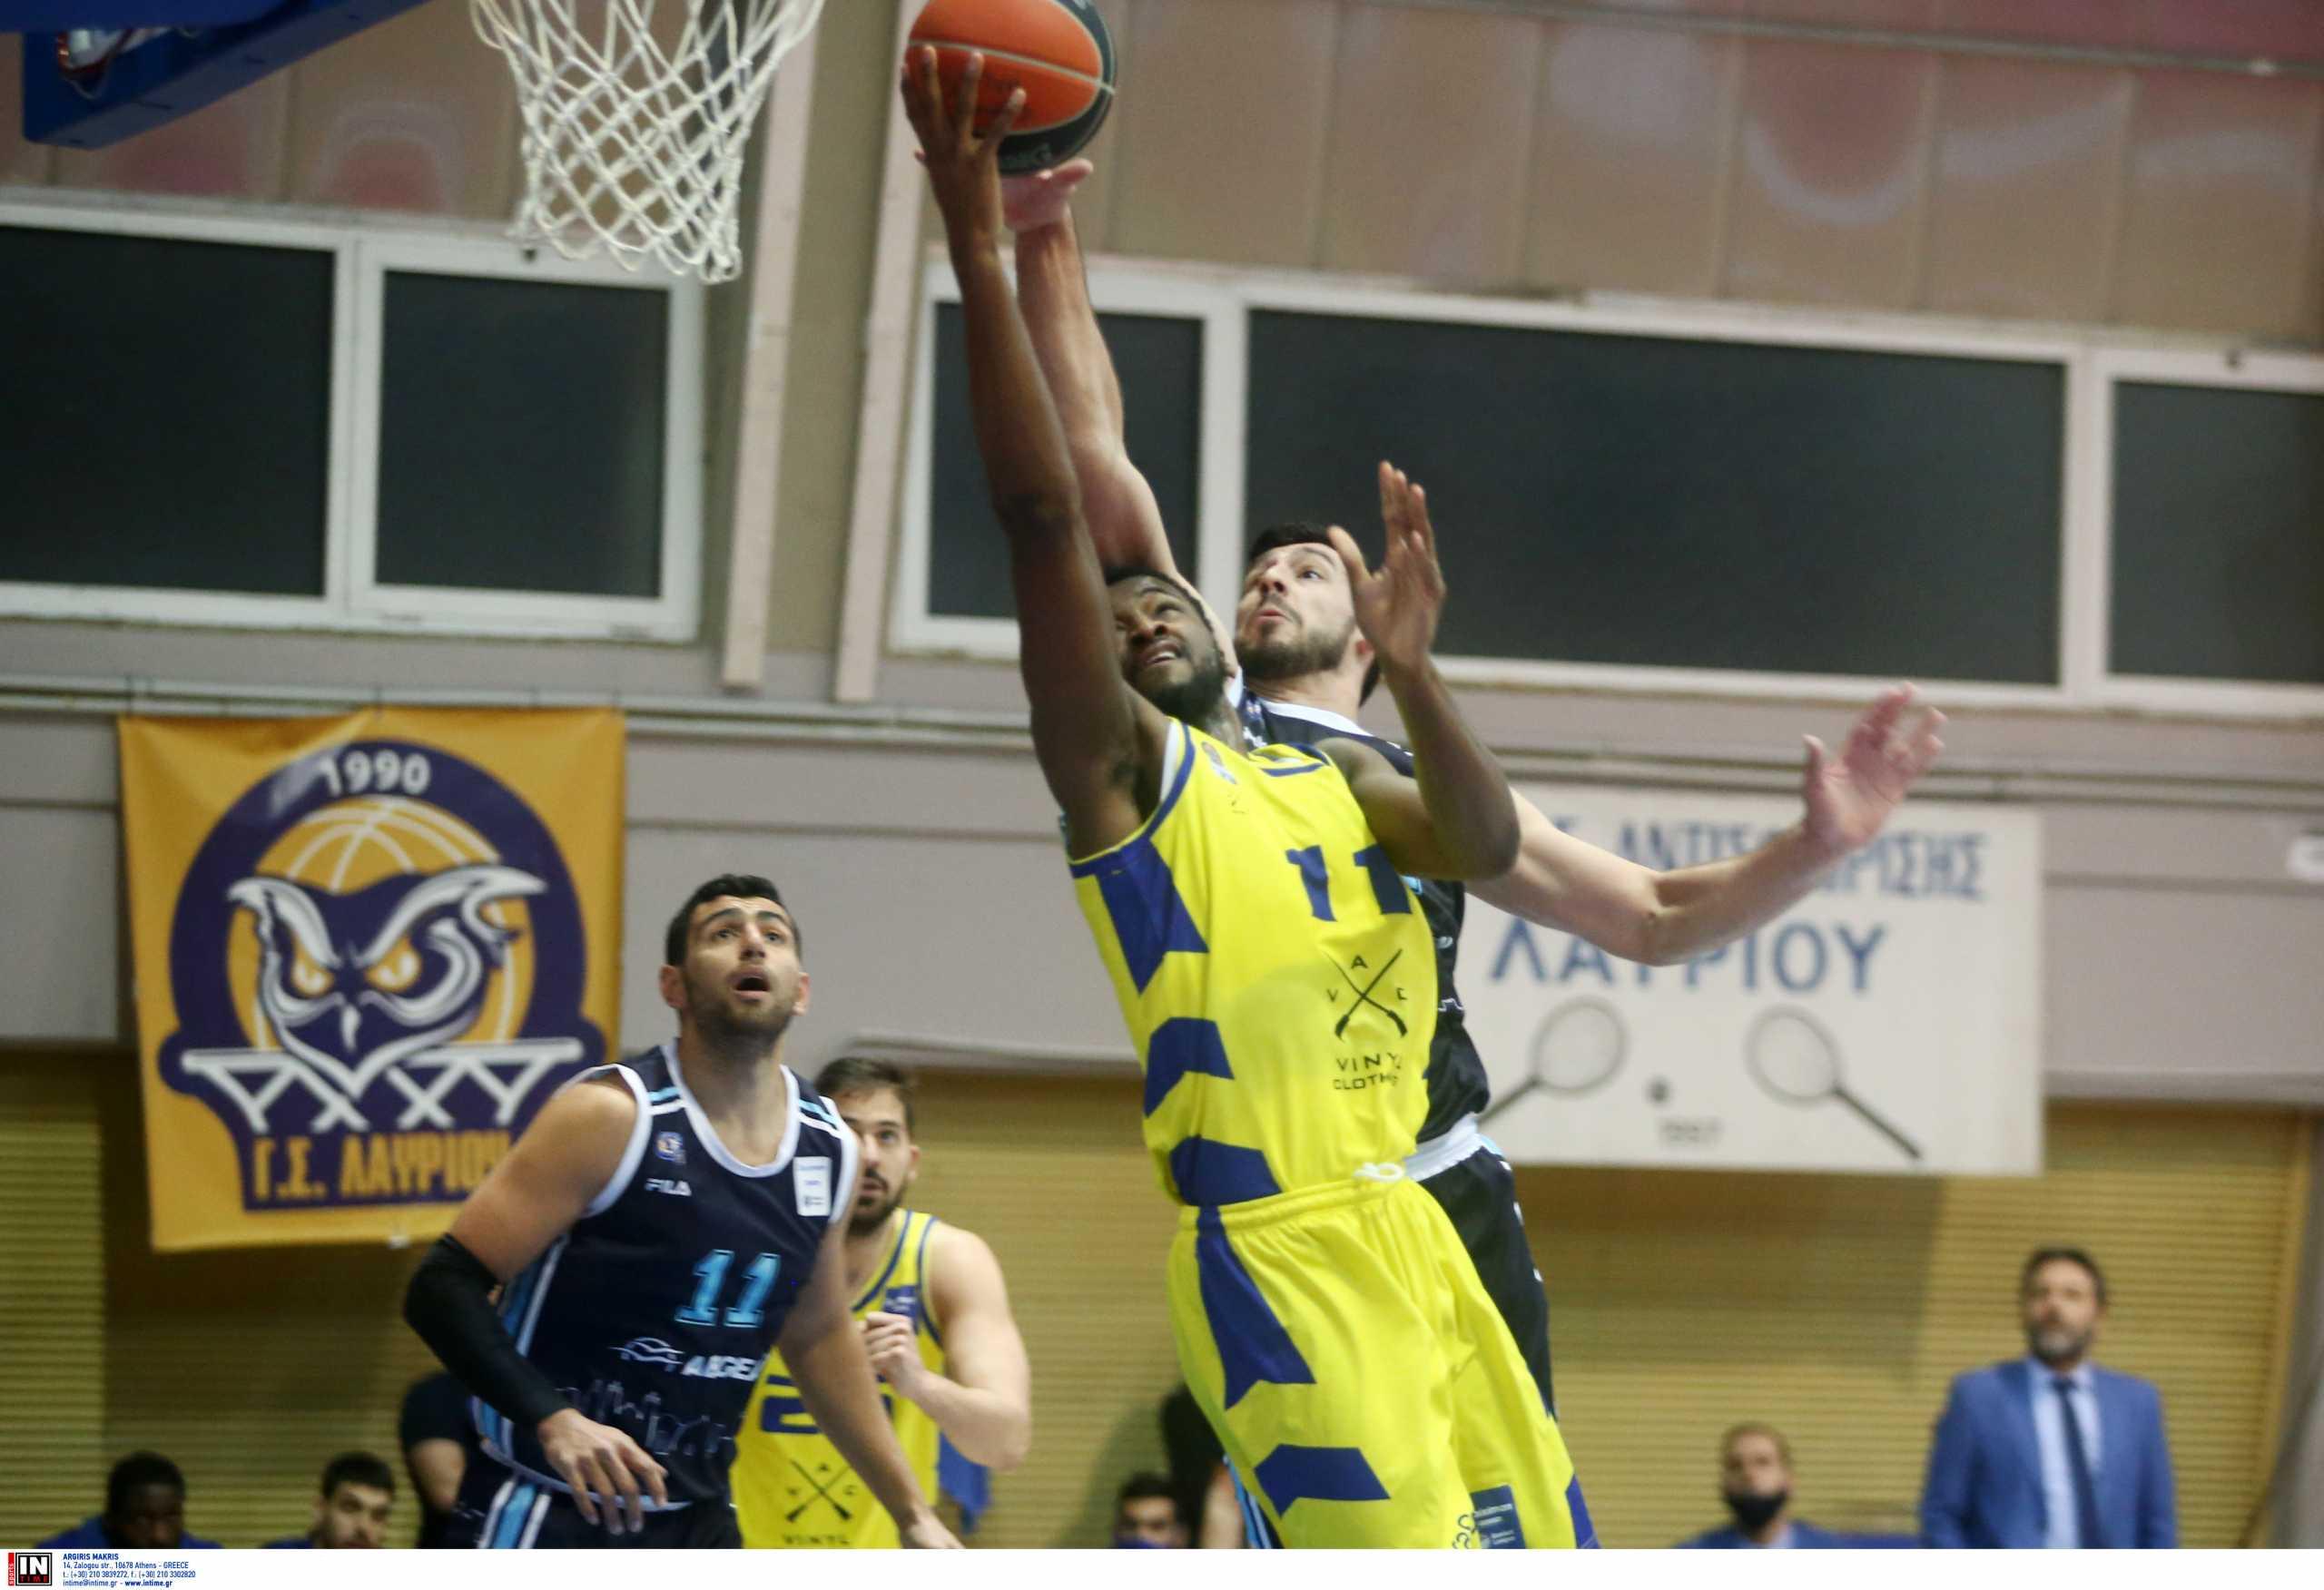 Basket League: Με «σπασμένα φρένα» το «αλύγιστο» Λαύριο συνεχίζει στην κορυφή (video)